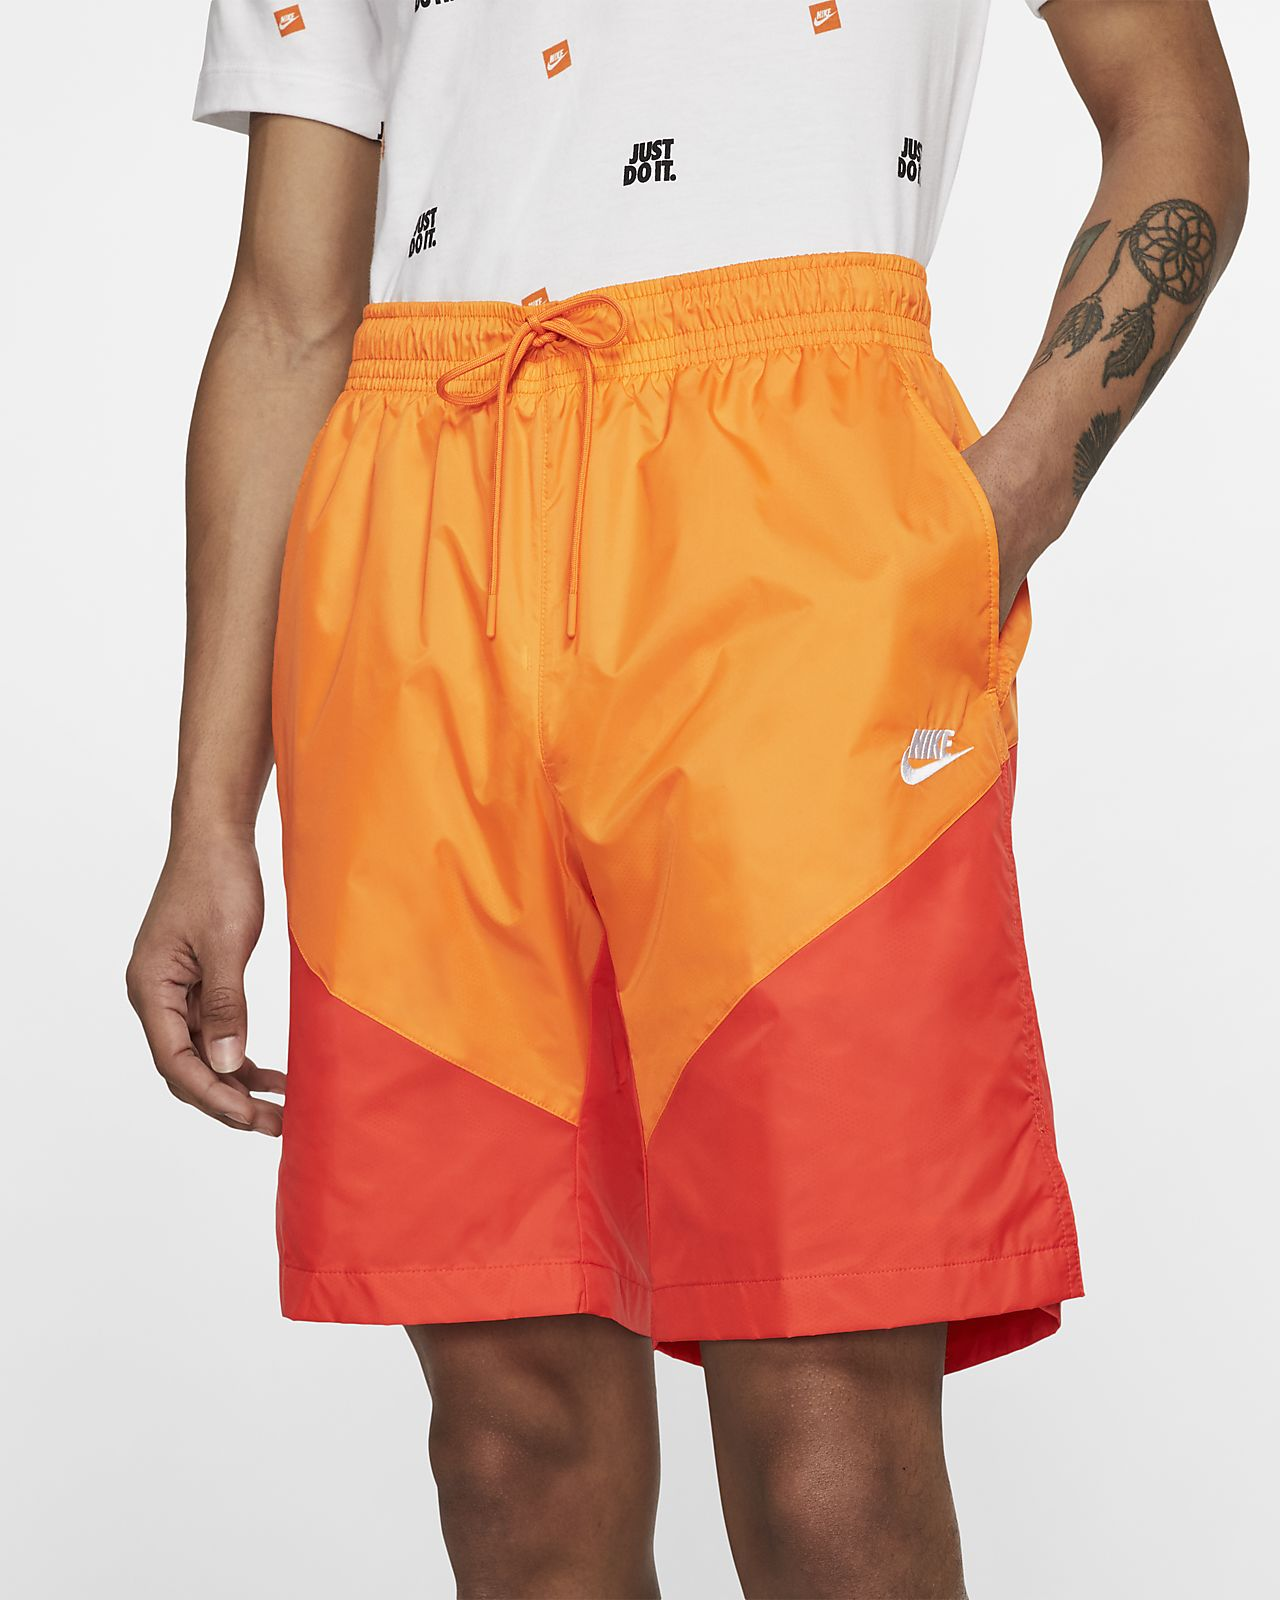 2d3eec83d868a5 Nike Sportswear Windrunner Men's Track Shorts. Nike.com PT